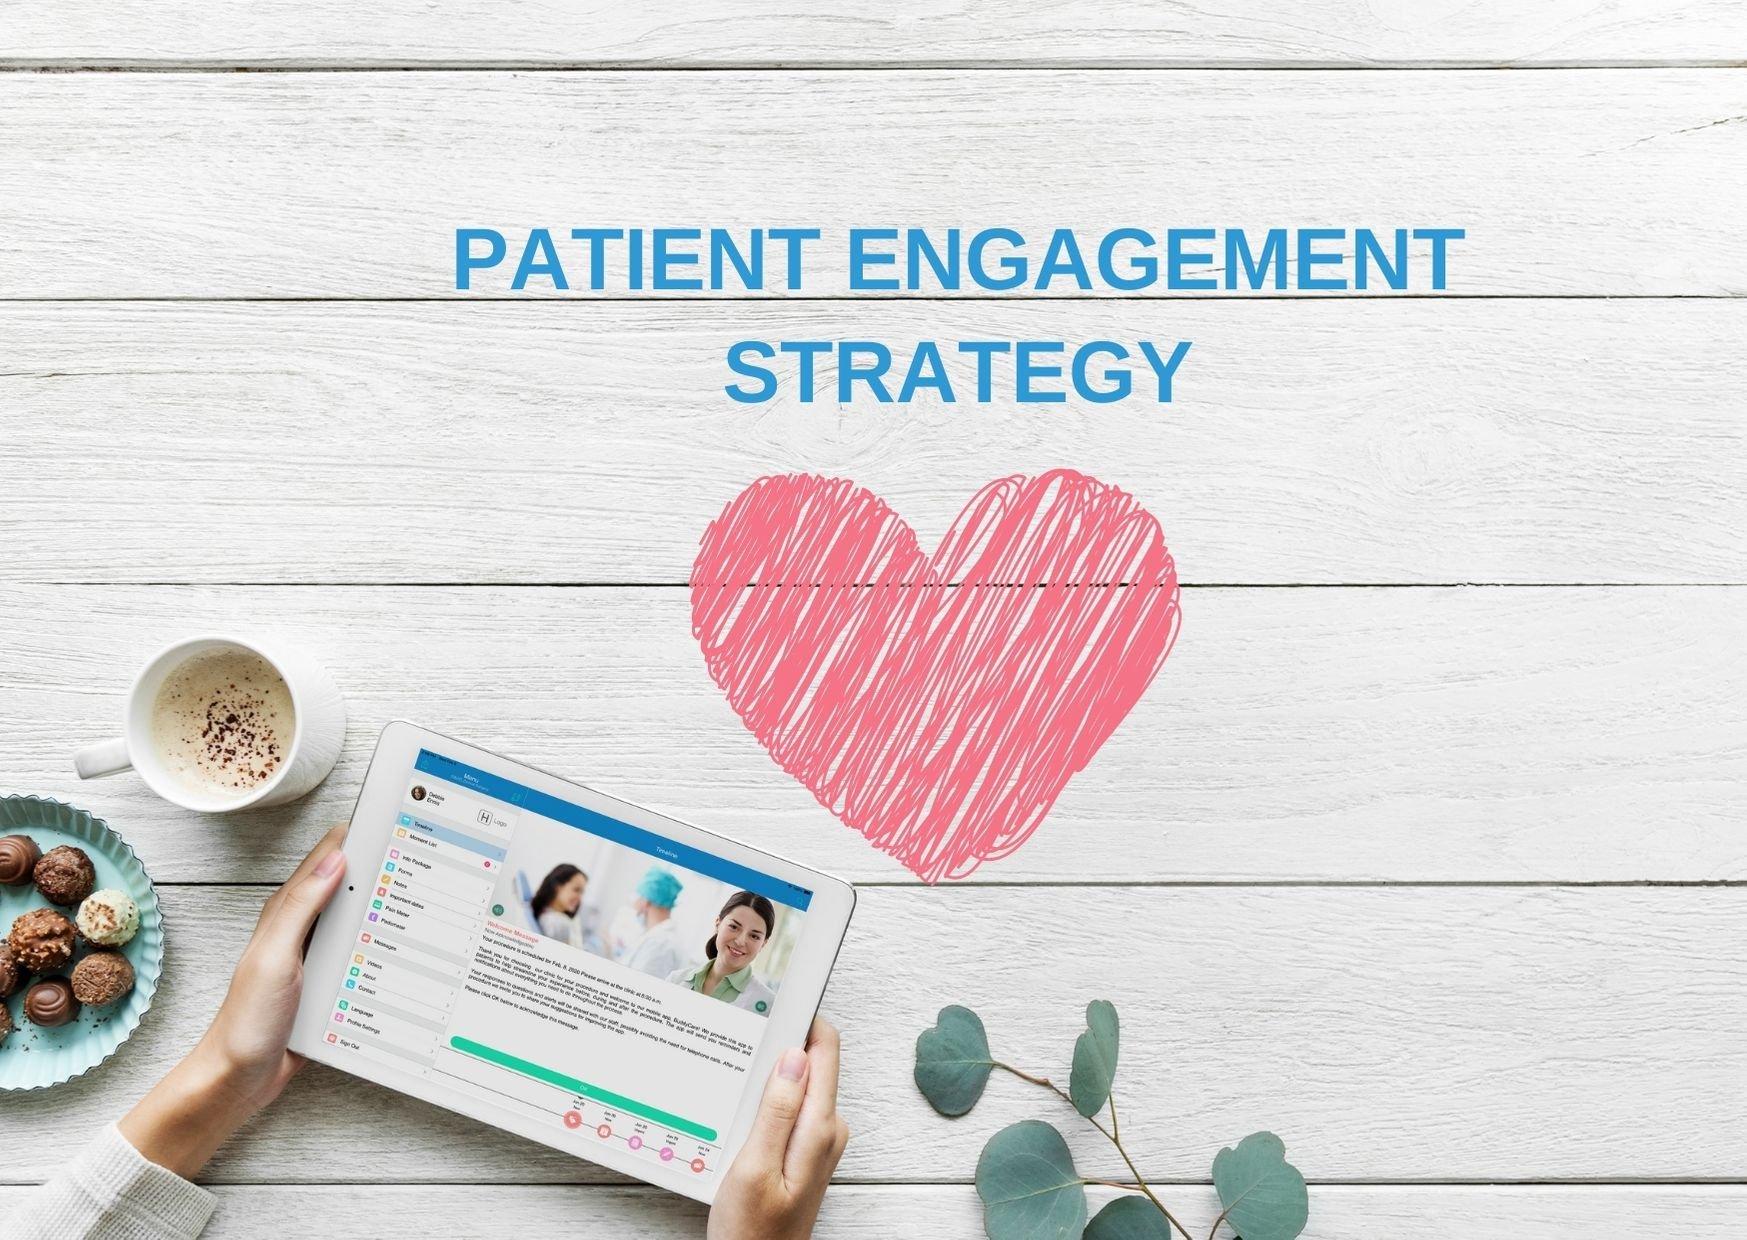 Patient engagement strategy